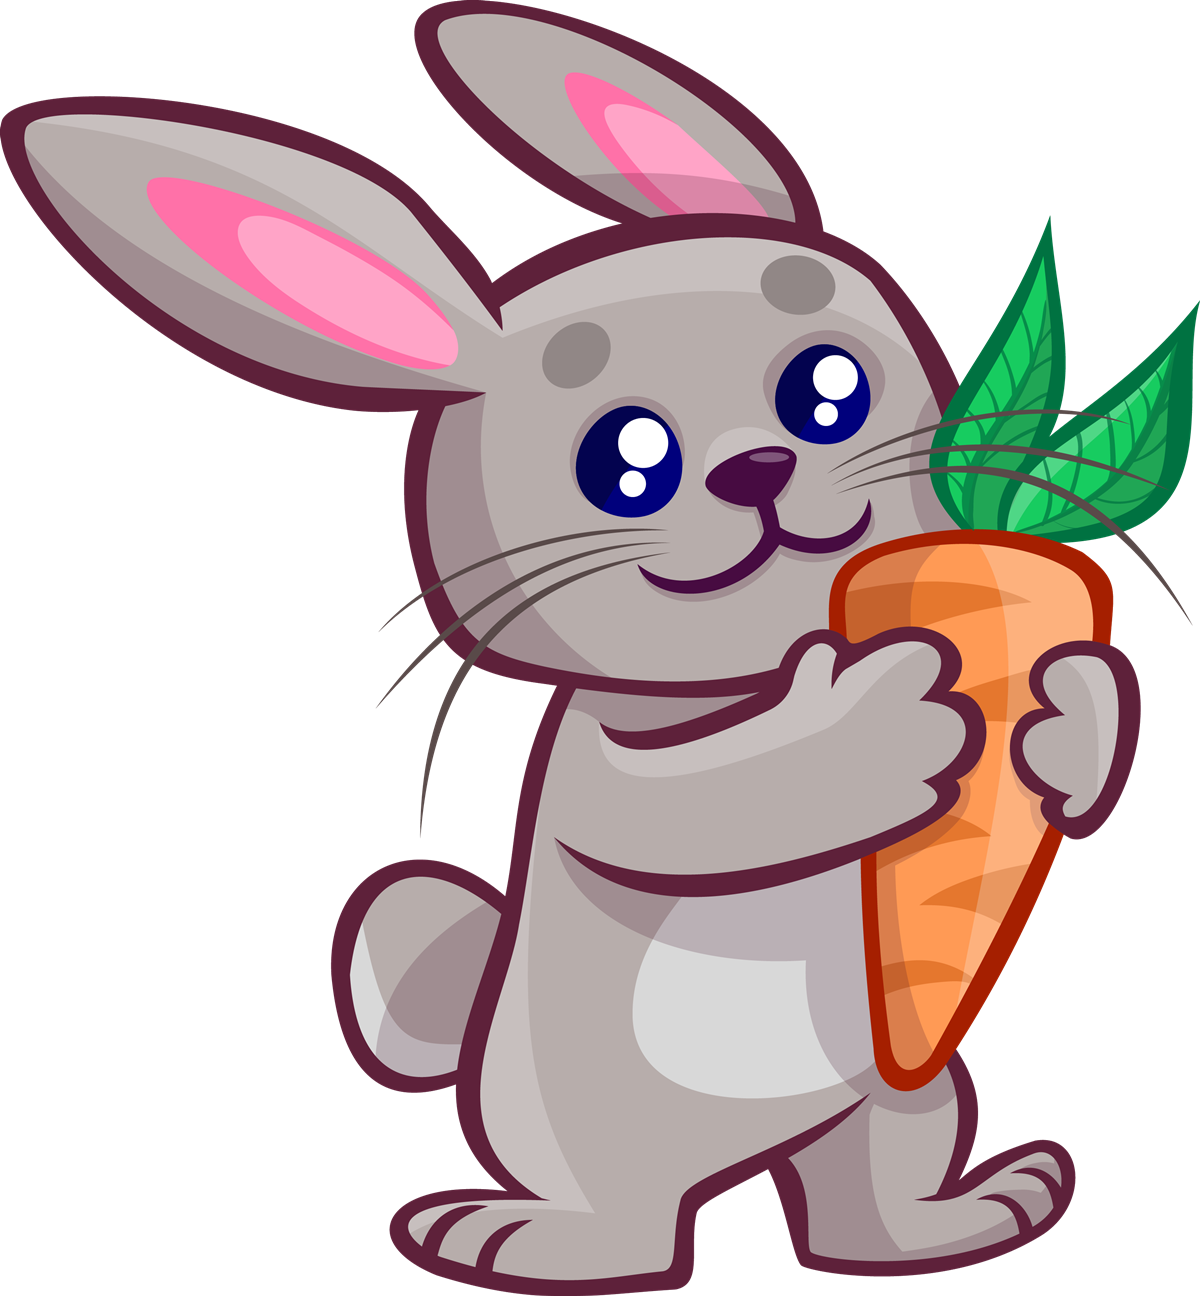 Free clipart rabbit. Imagination bunny cartoon pic